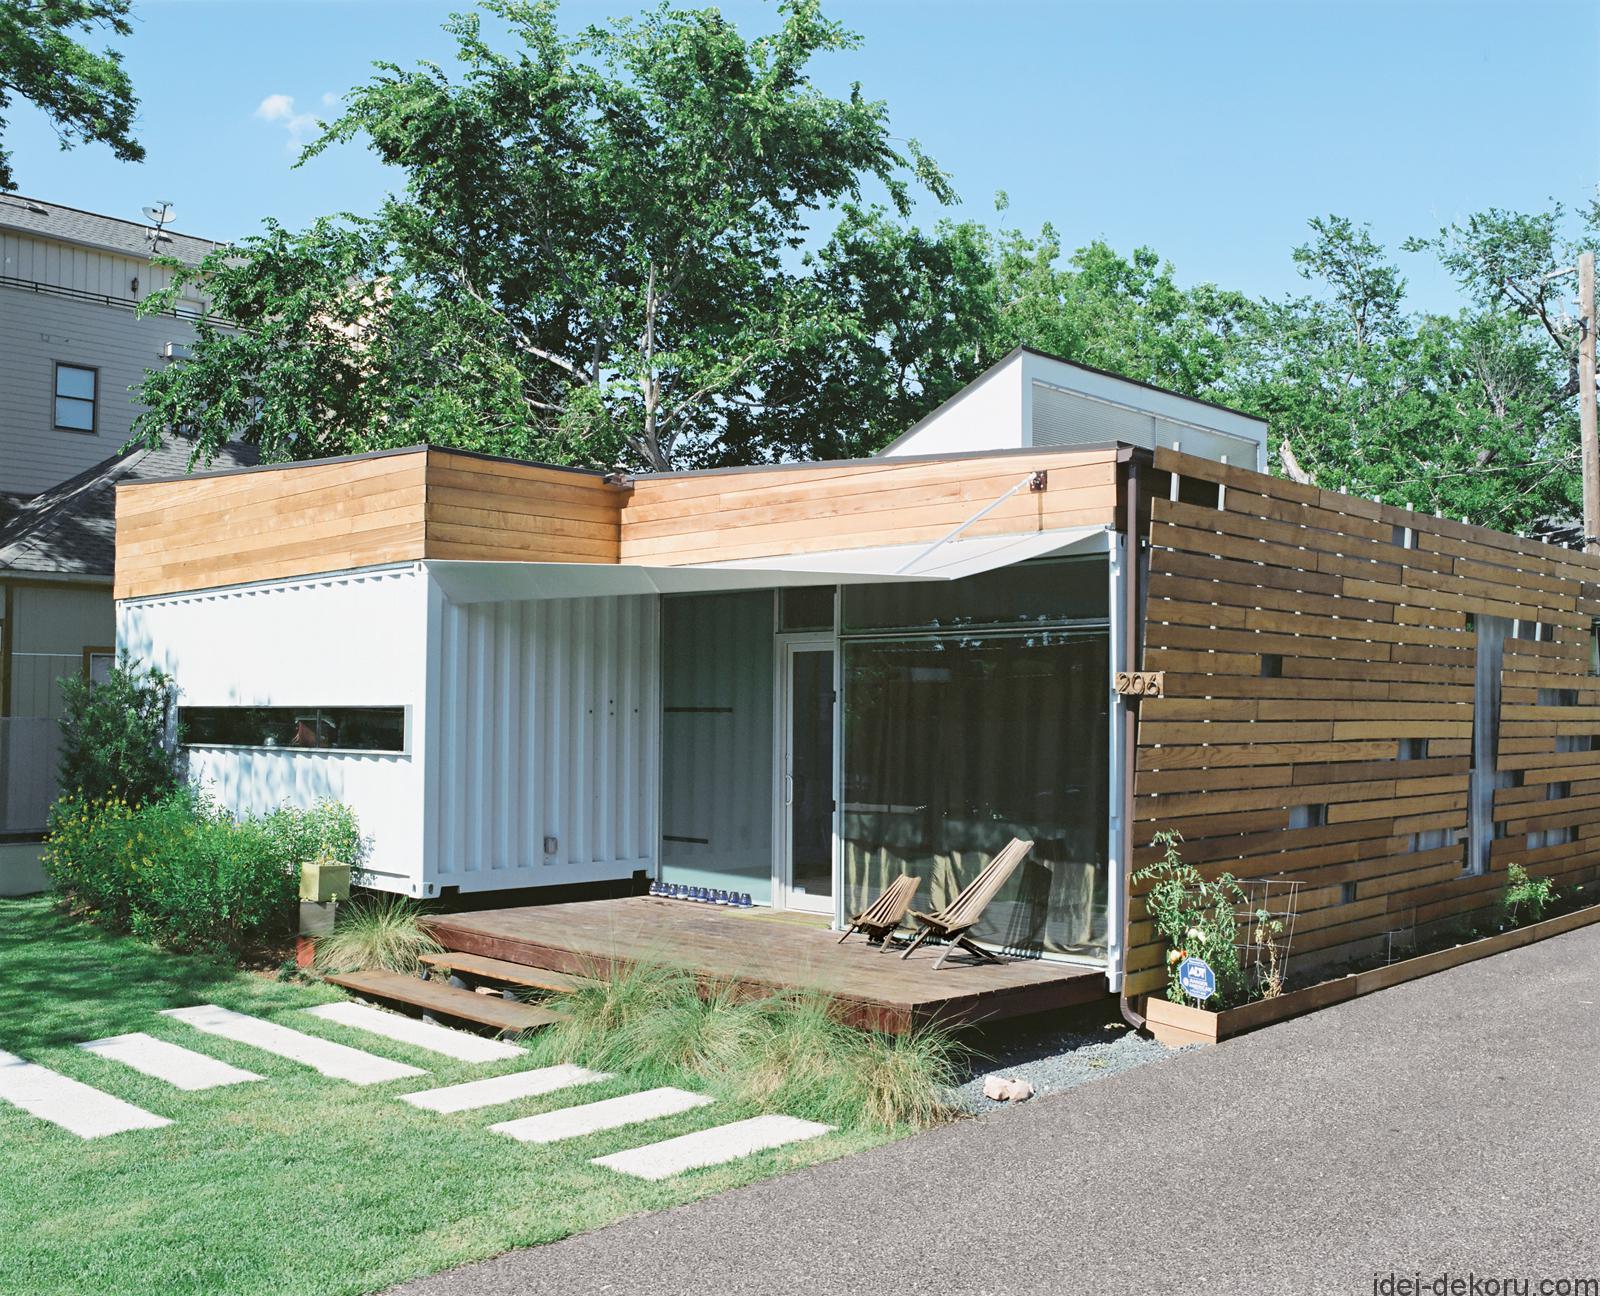 freeman-feldmann-house-houston-texas-exterior